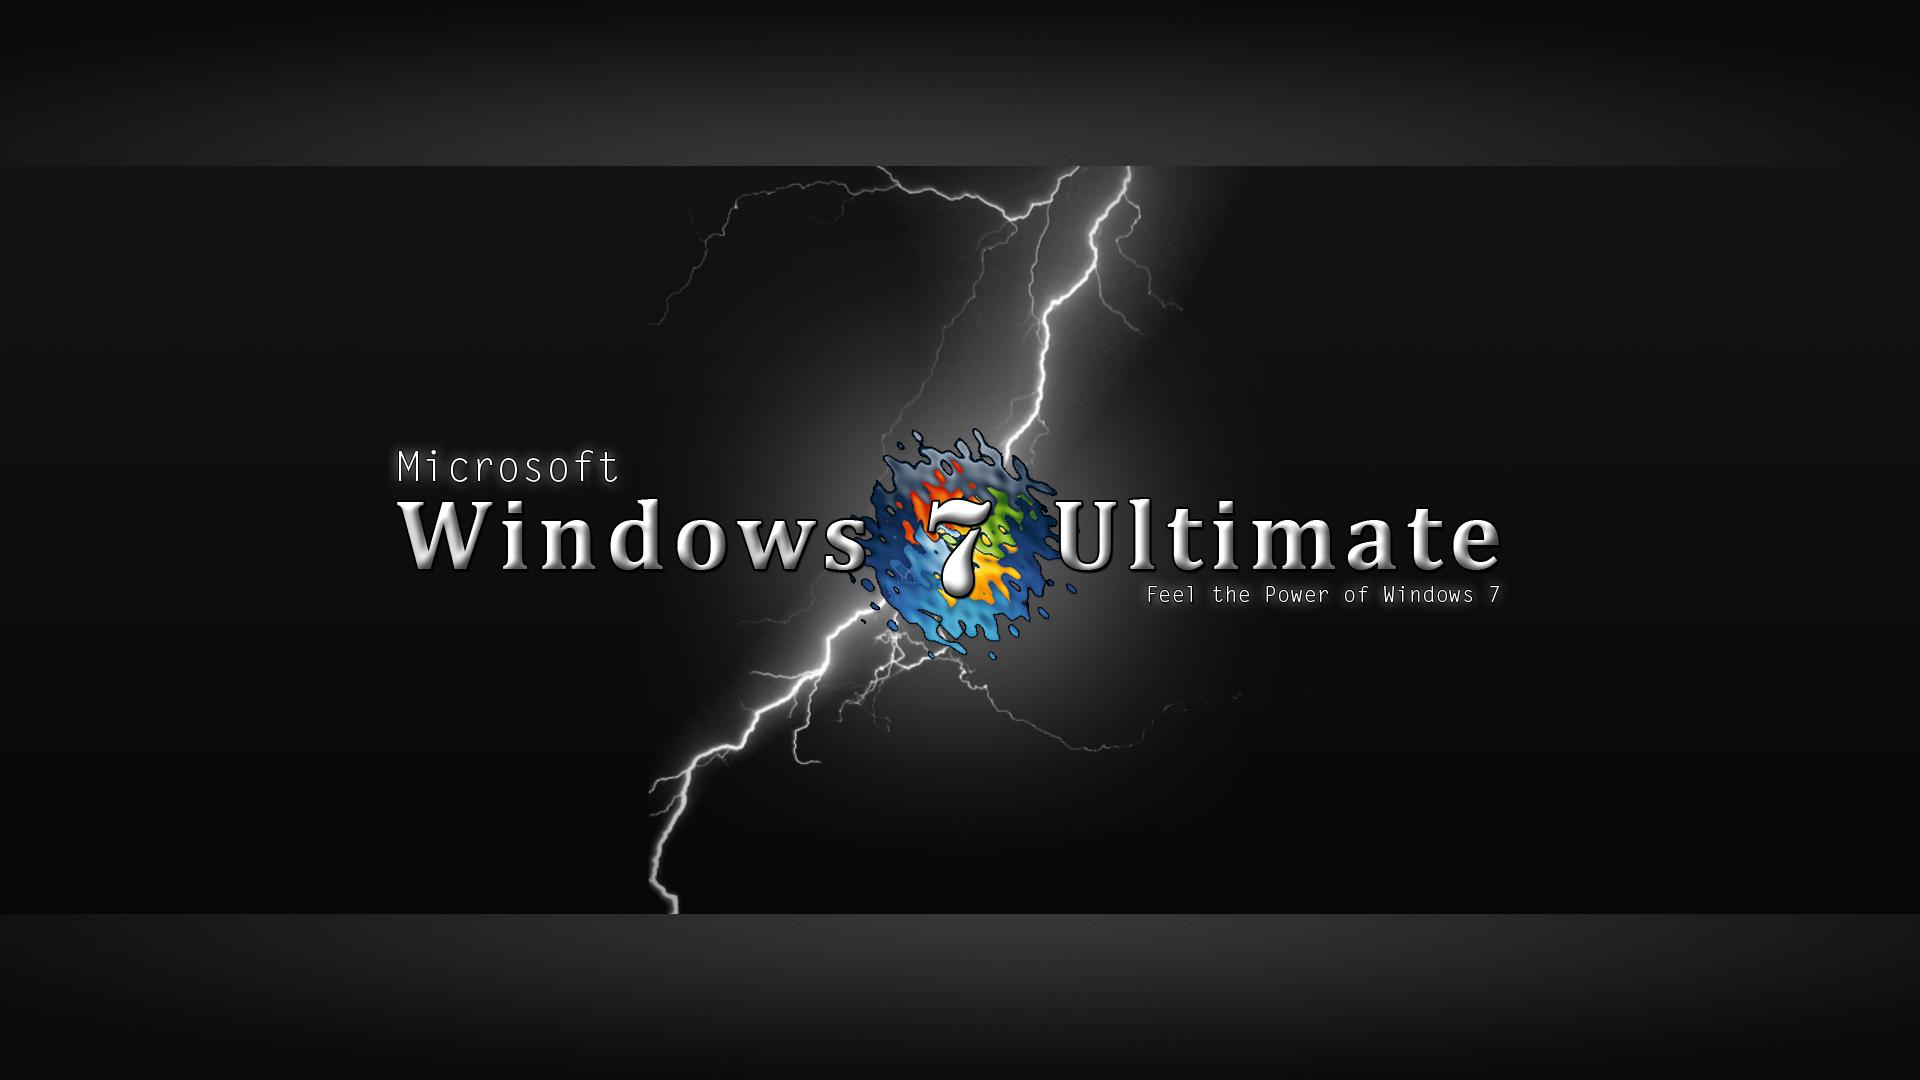 download Windows 7 Ultimate Black Wallpaper Brands Wallpaper 1920x1080